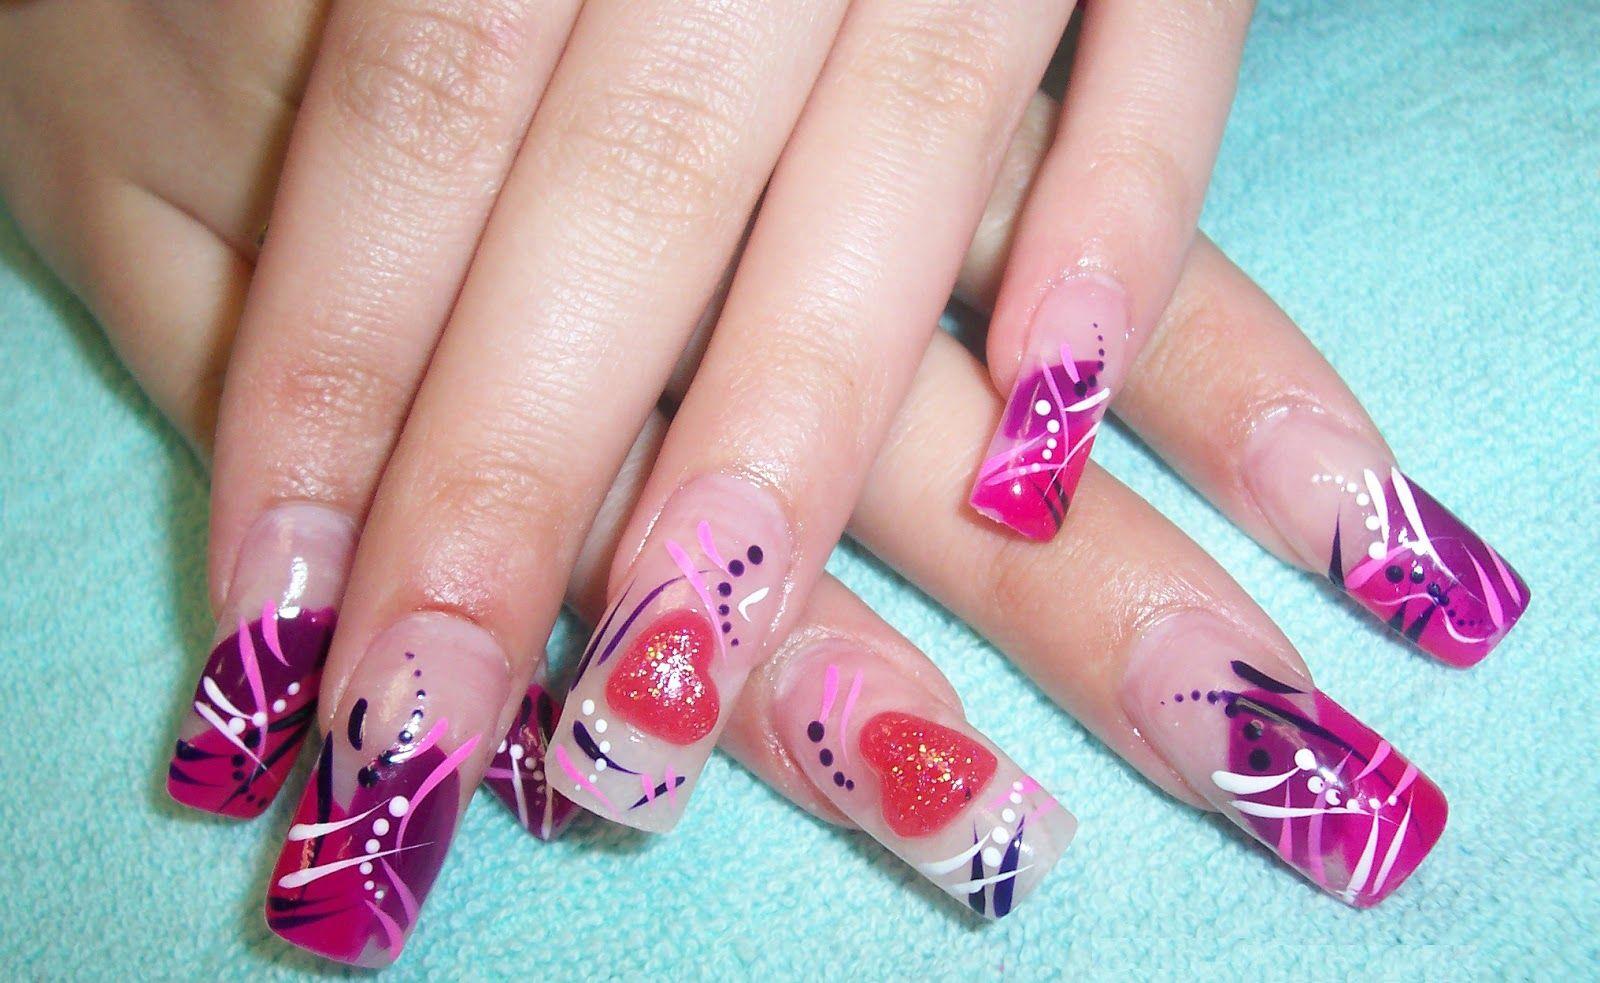 Dorable Cute Nail Designs For Acrylic Nails Gift - Nail Art Ideas ...